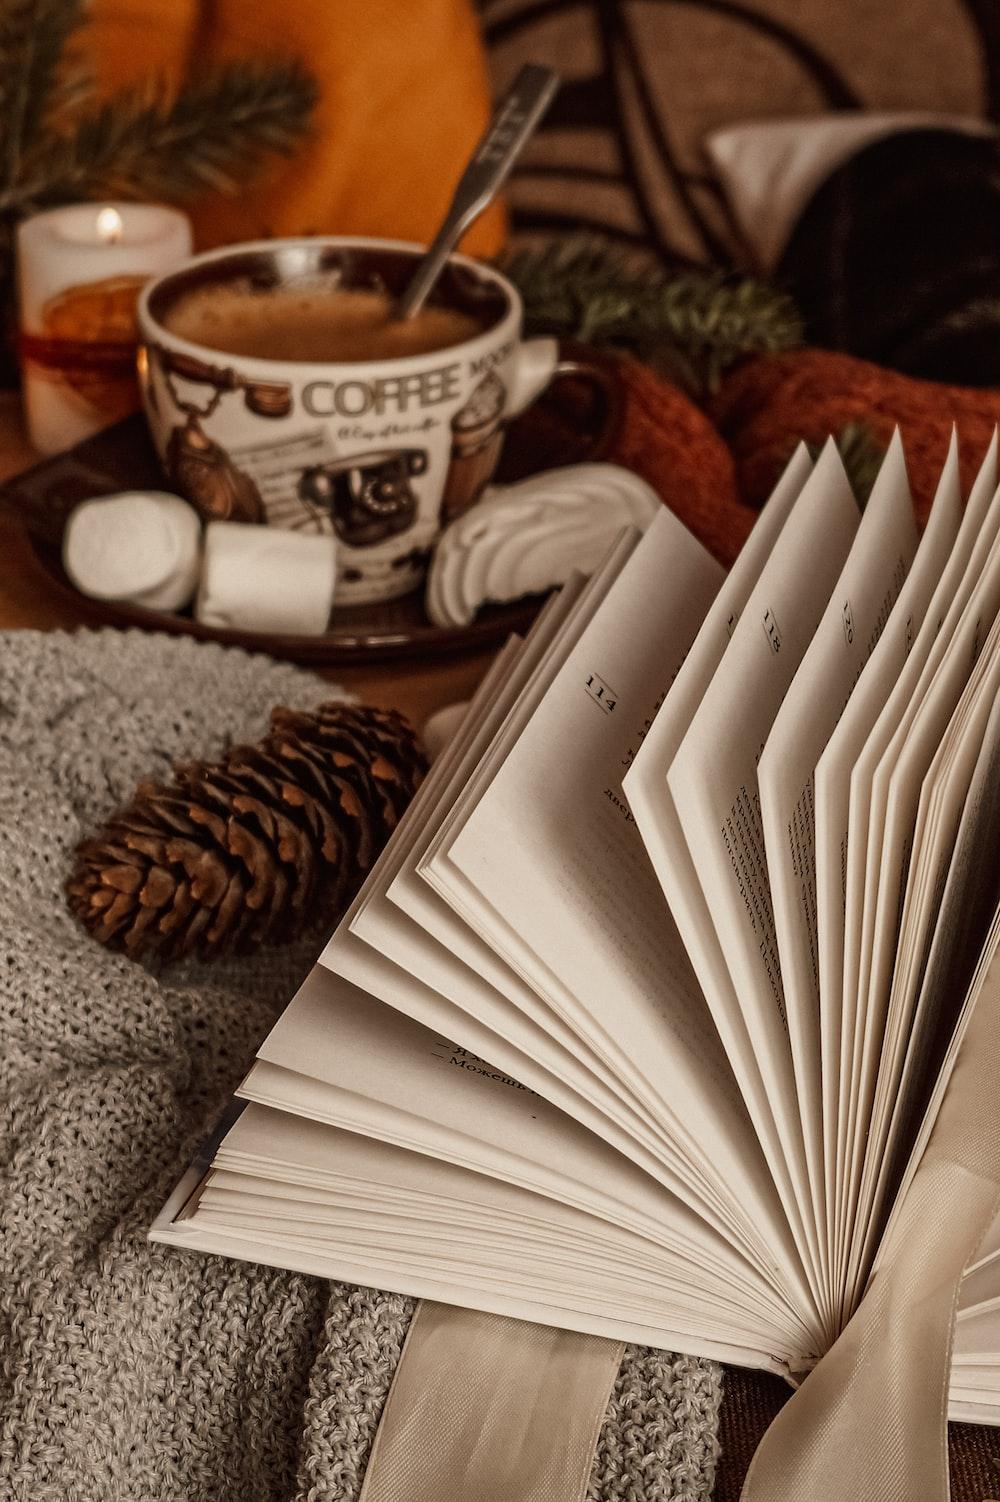 white book on brown and white ceramic mug